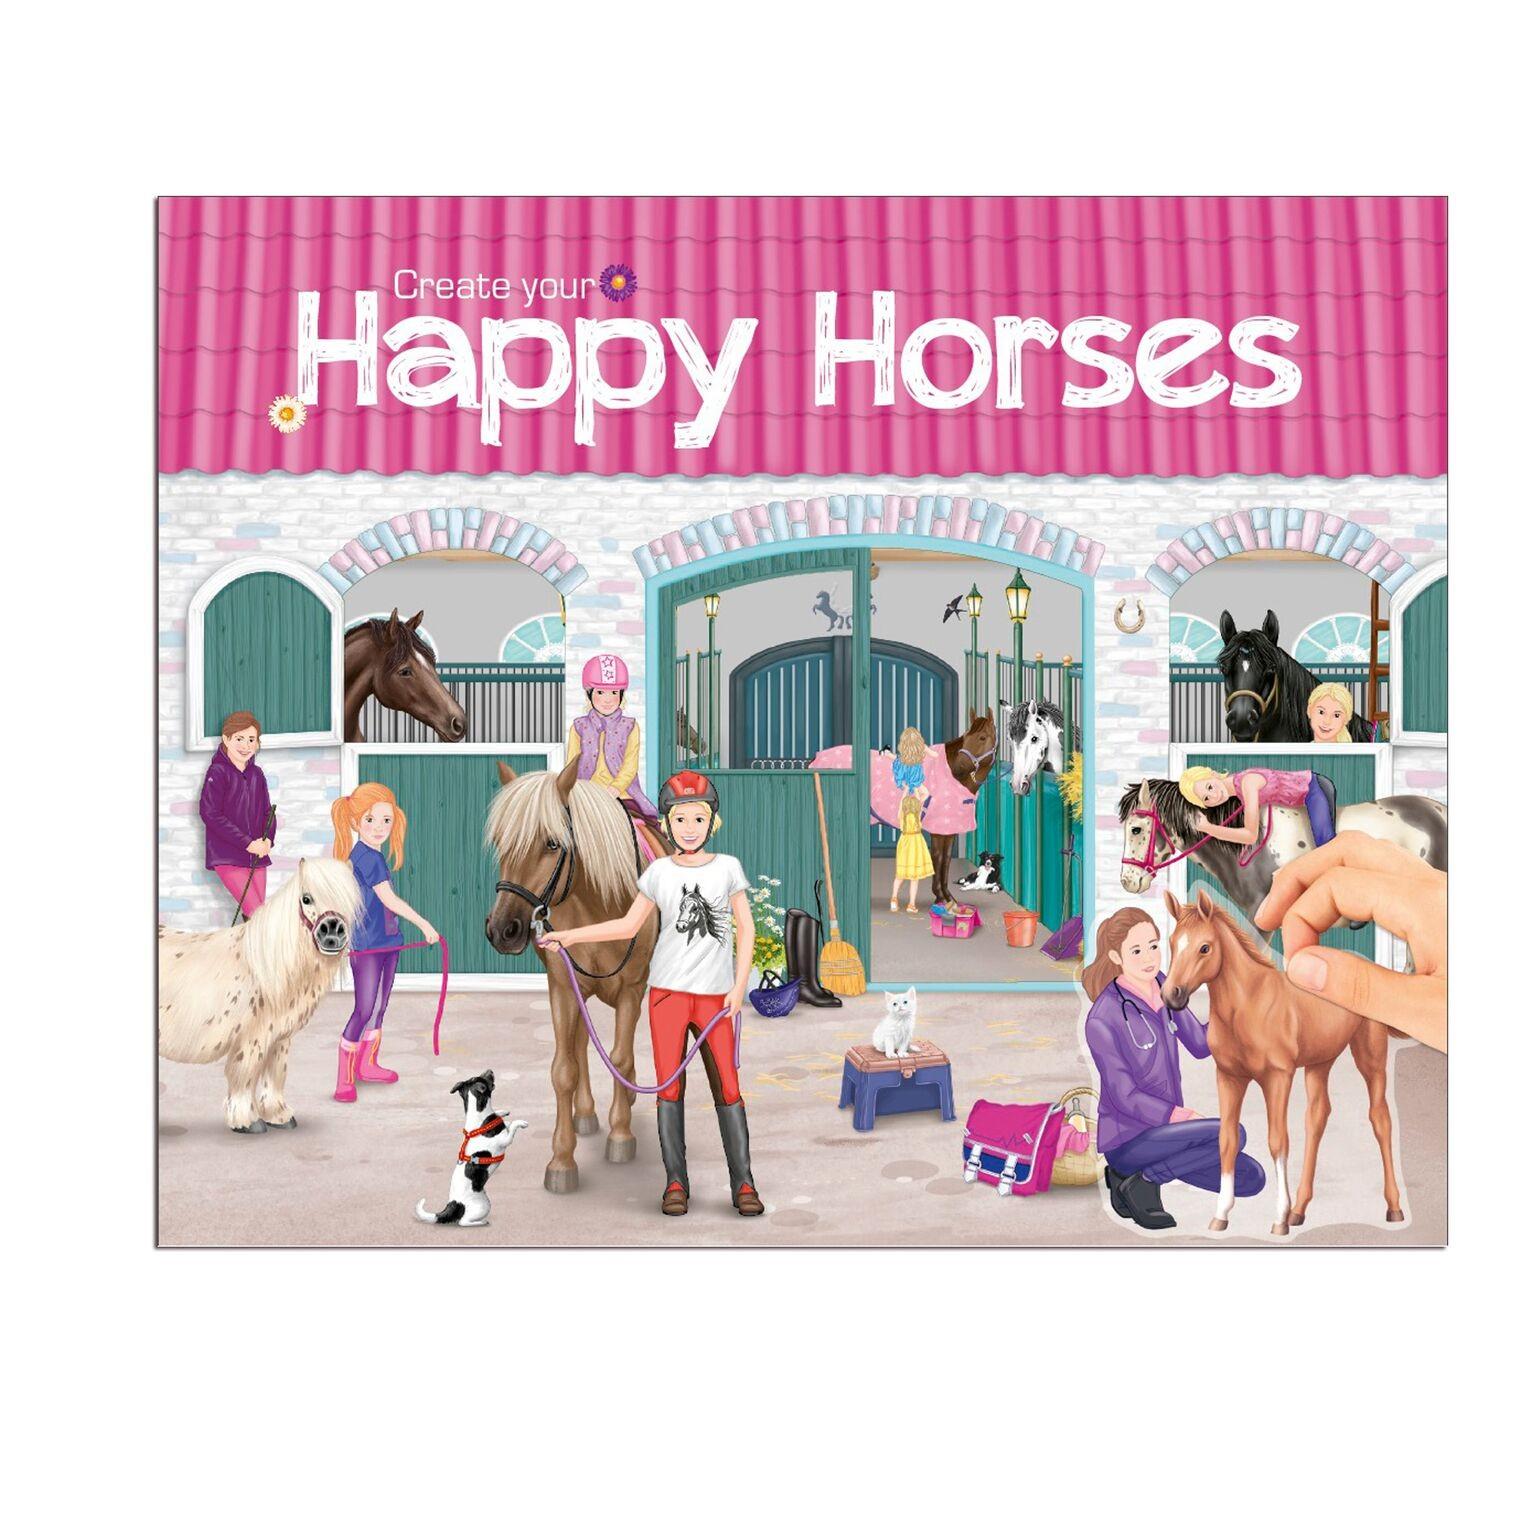 Creative Studio - Create your Happy Horses Pysselbok (bokmoms)